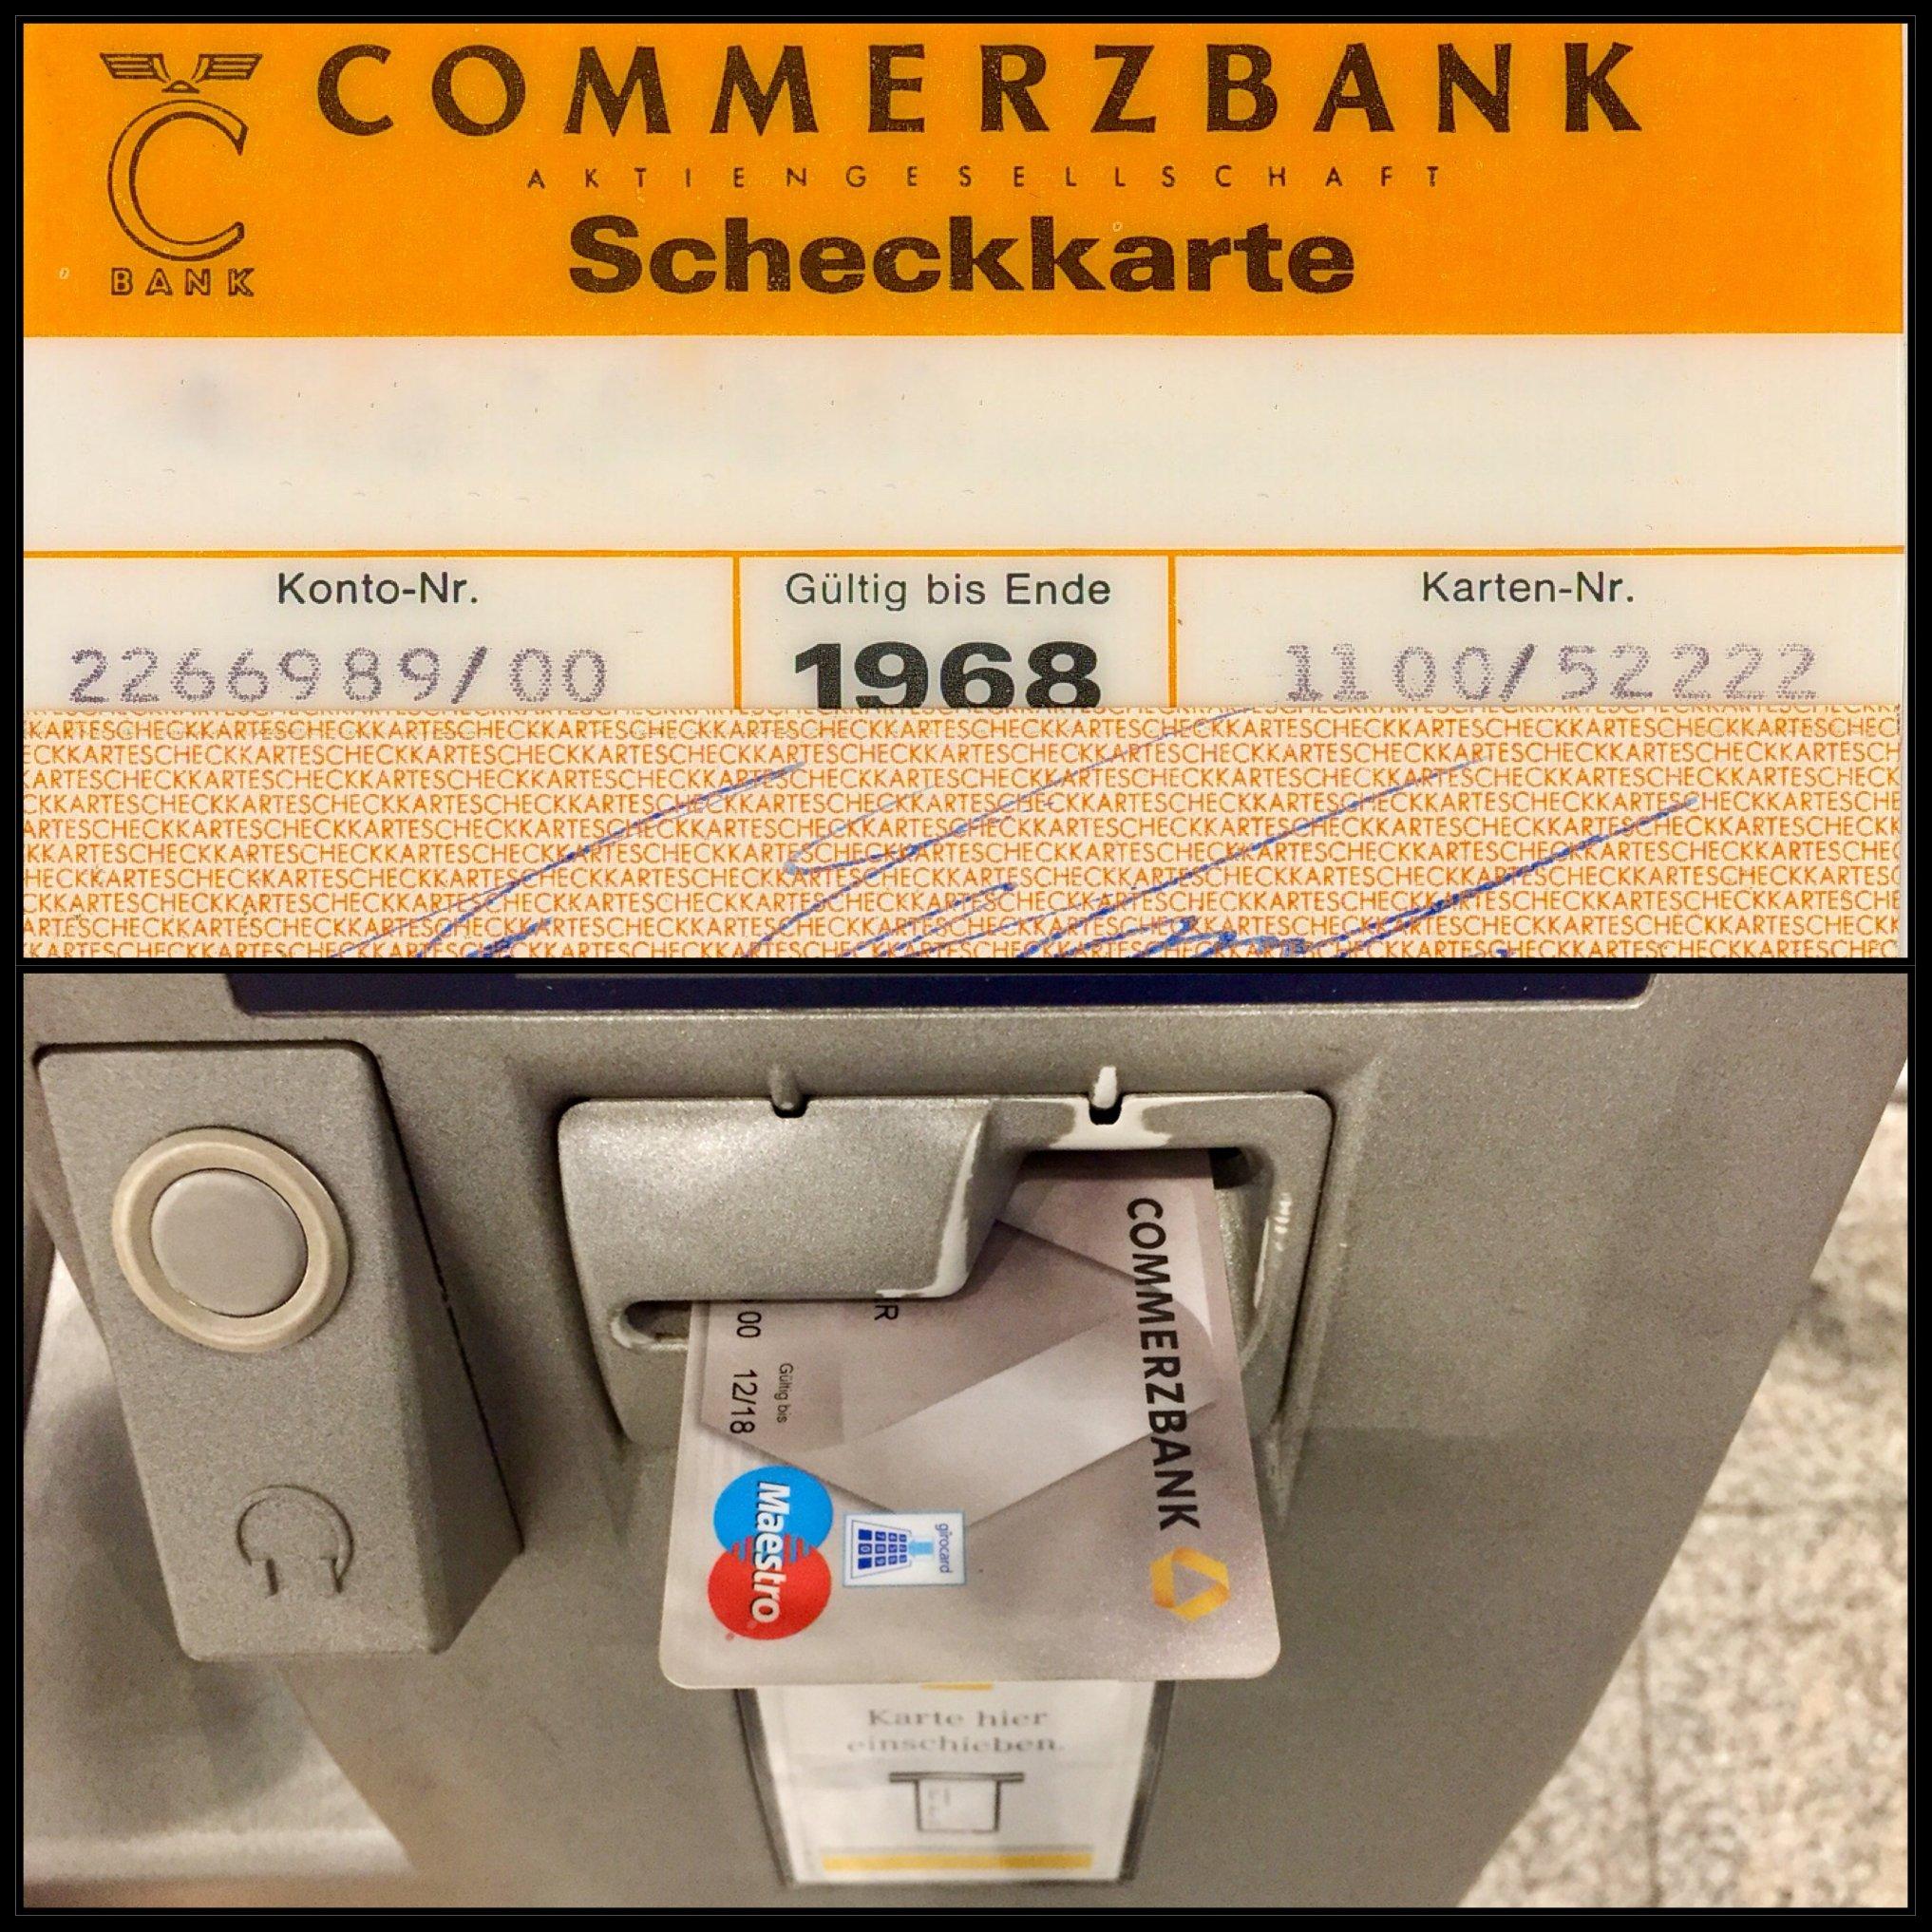 Kartennummer Ec Karte Commerzbank.Commerzbank Girocard